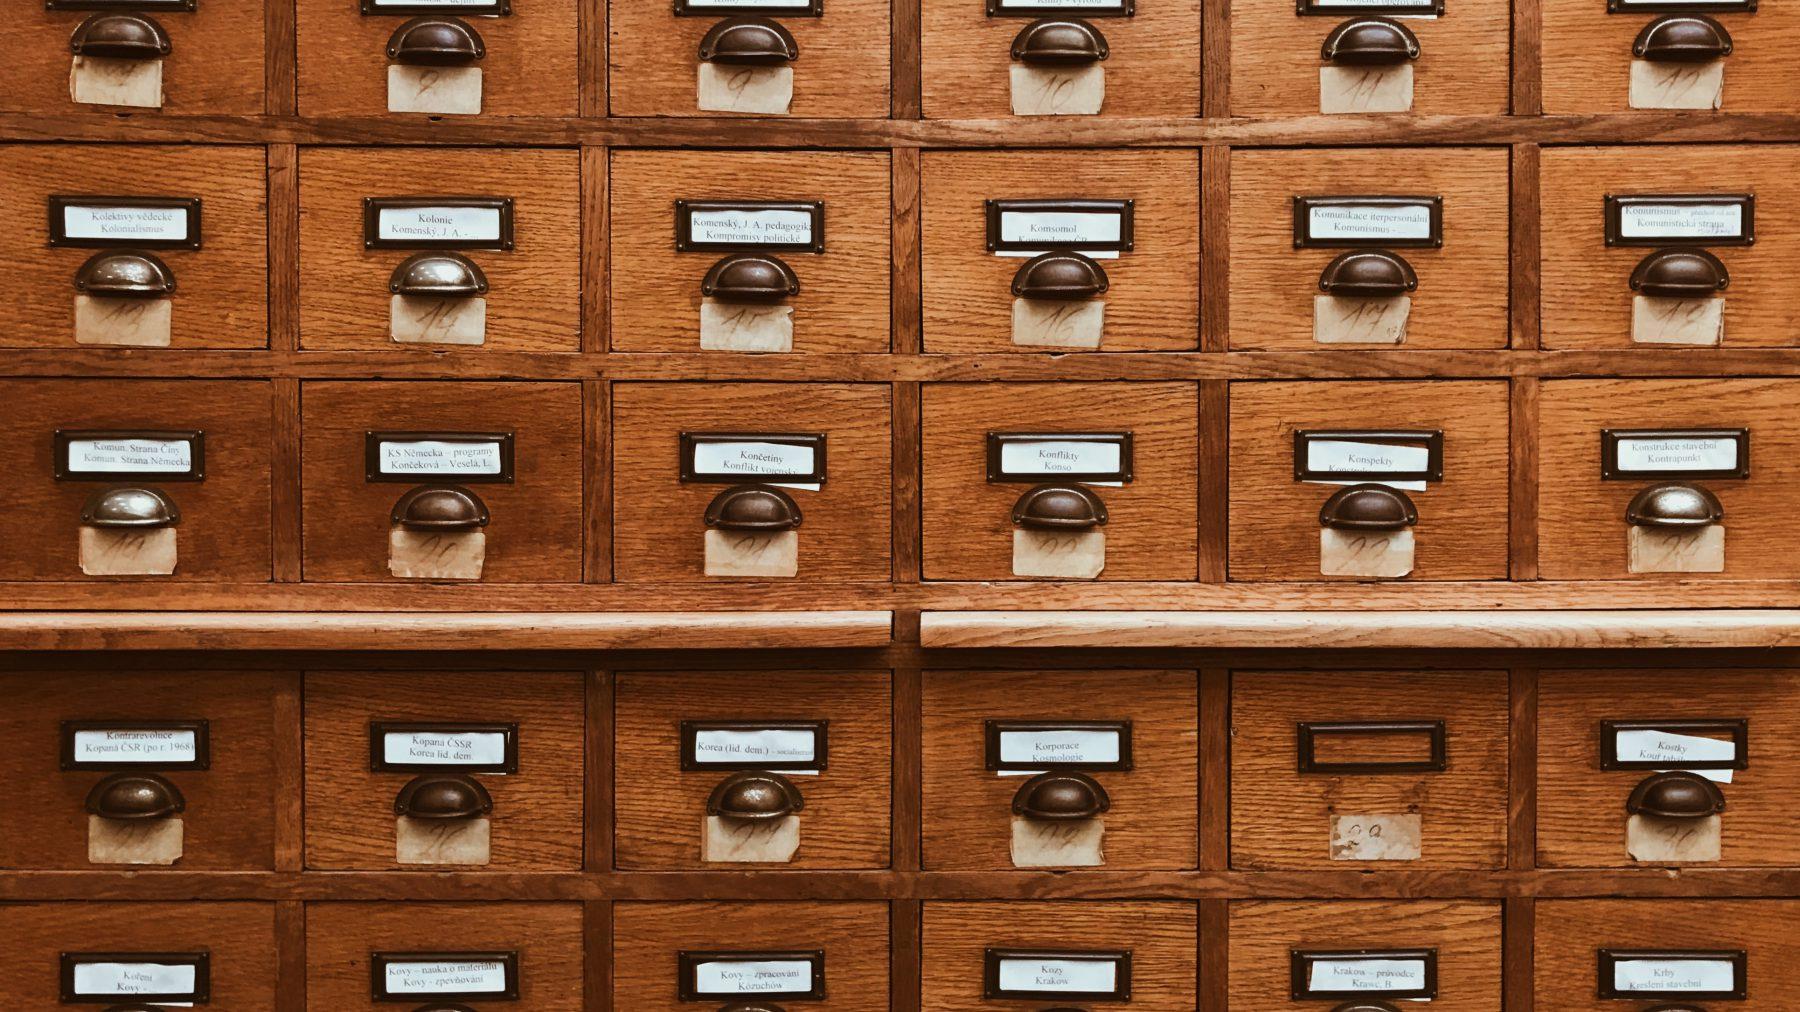 [MySQL] 如何開啟遠端連線的權限,允許遠端裝置連線資料庫